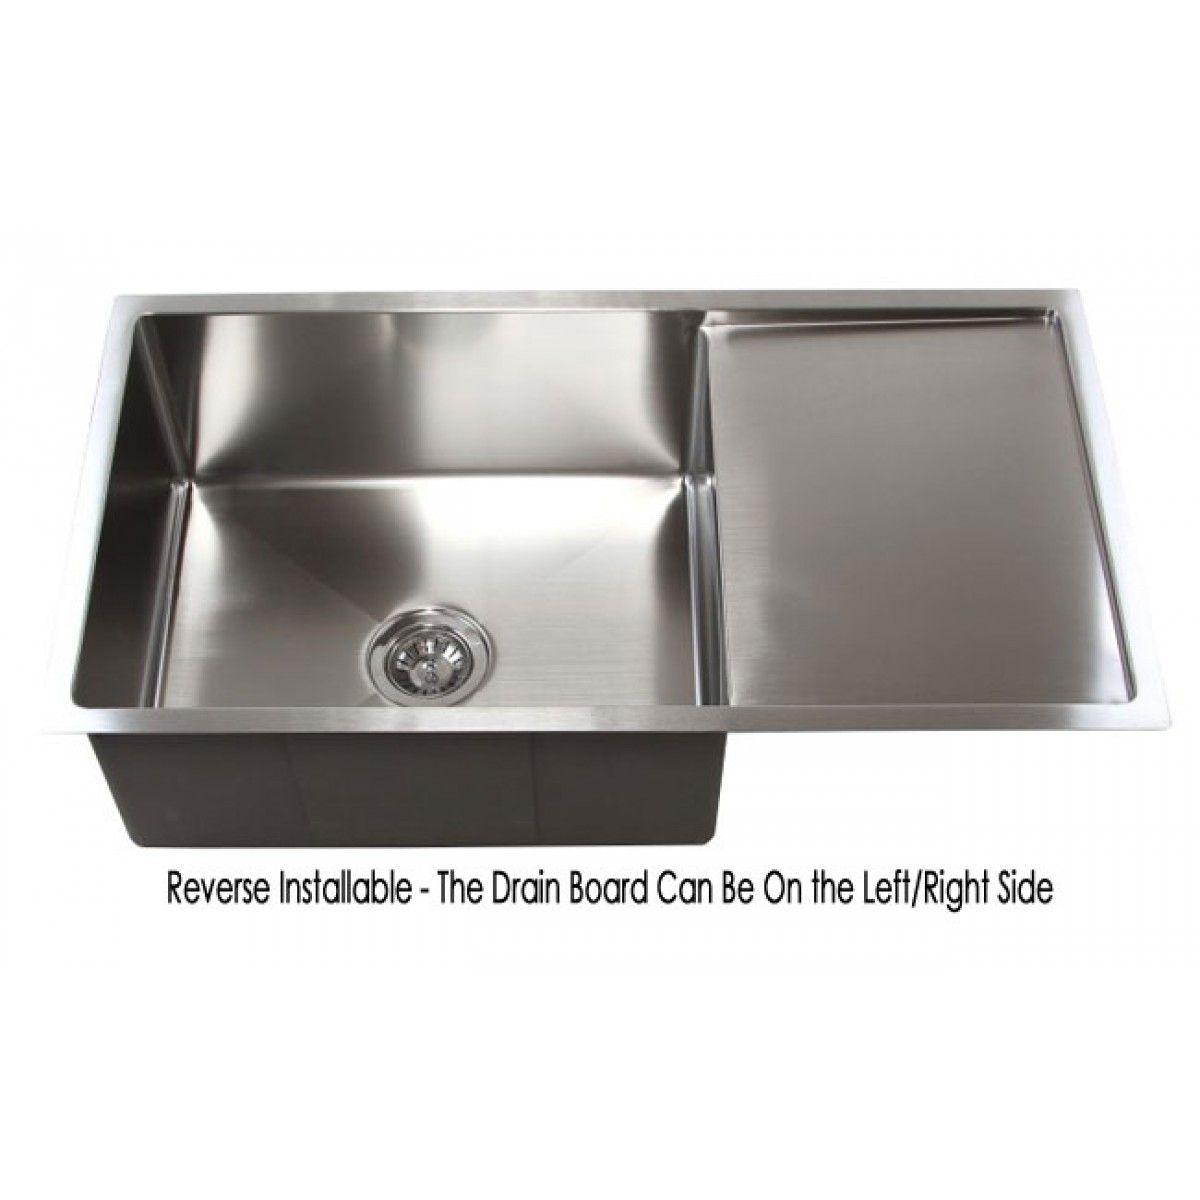 Delightful 36 Inch Stainless Steel Undermount Single Bowl Kitchen Sink With Drain Board